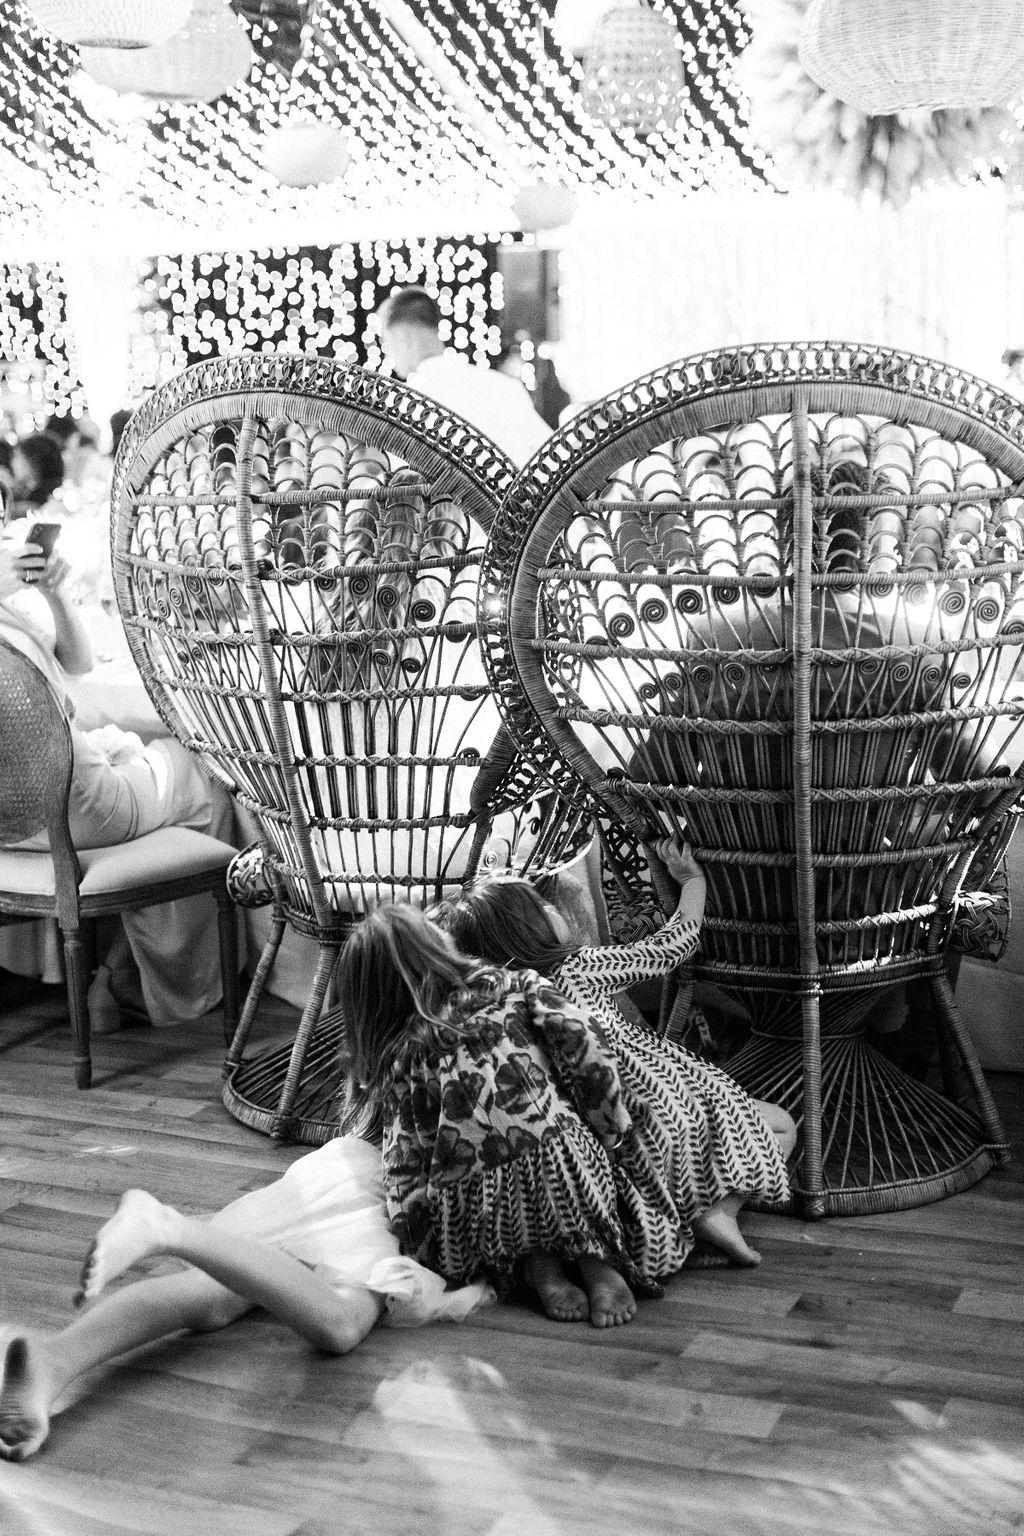 kids peeking around large wicker chairs at wedding reception